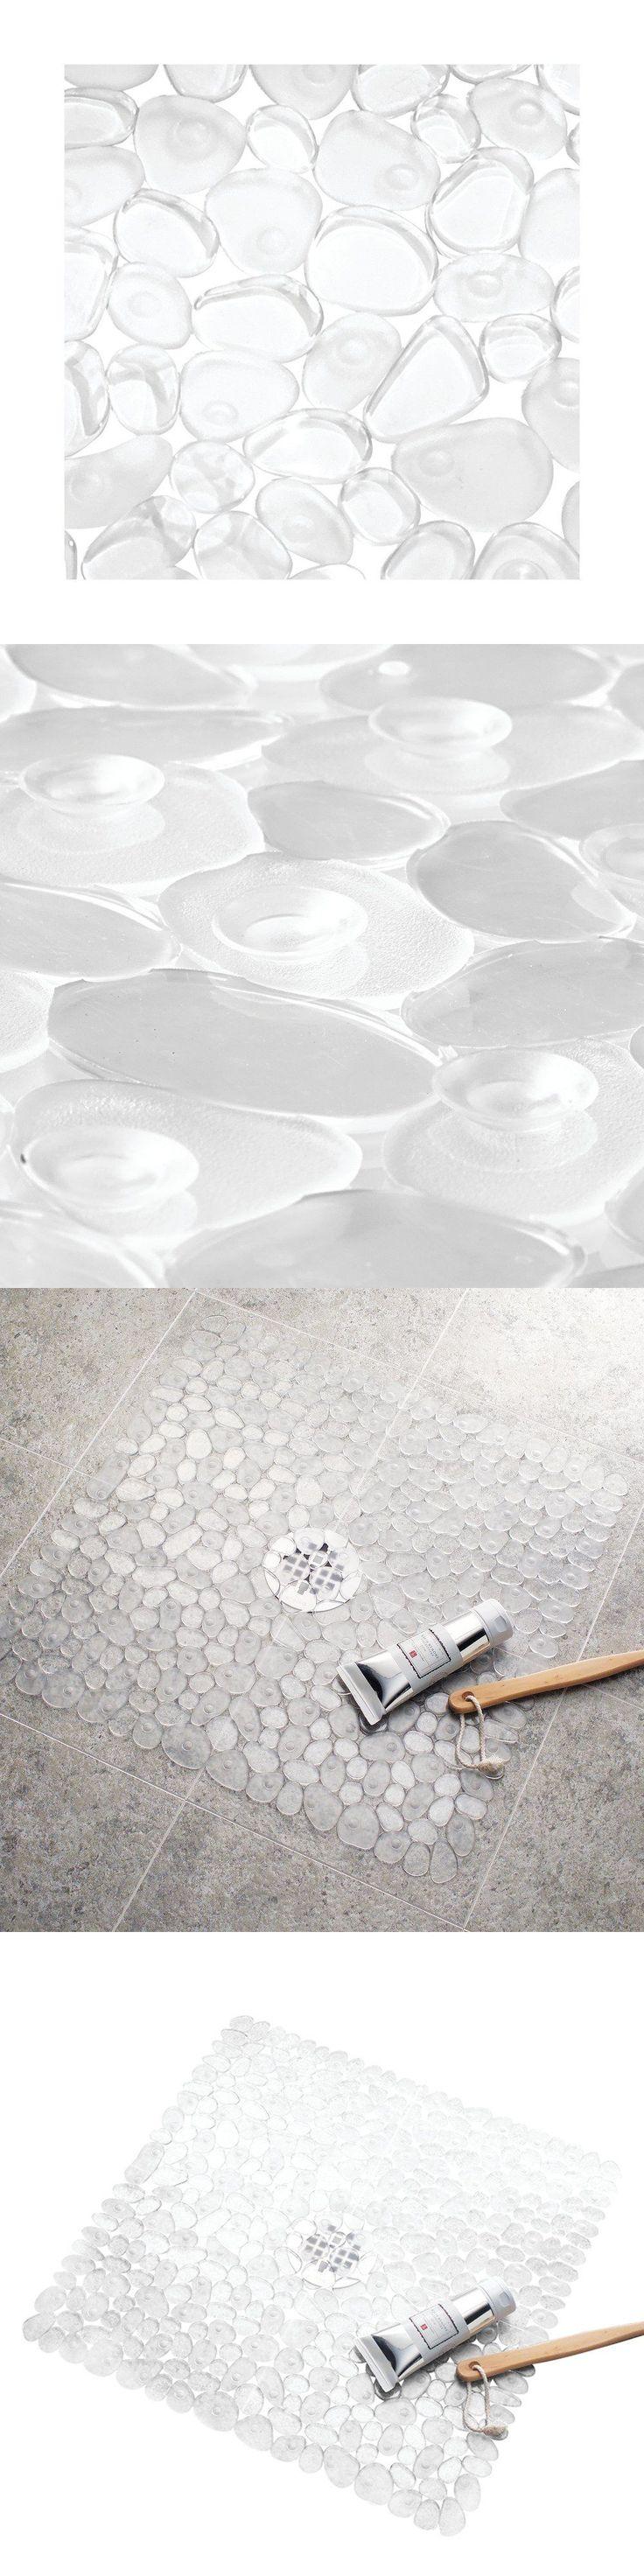 best 25 non slip shower mat ideas only on pinterest dorm non slip appliques and mats 66722 new clear bath mat non slip suction